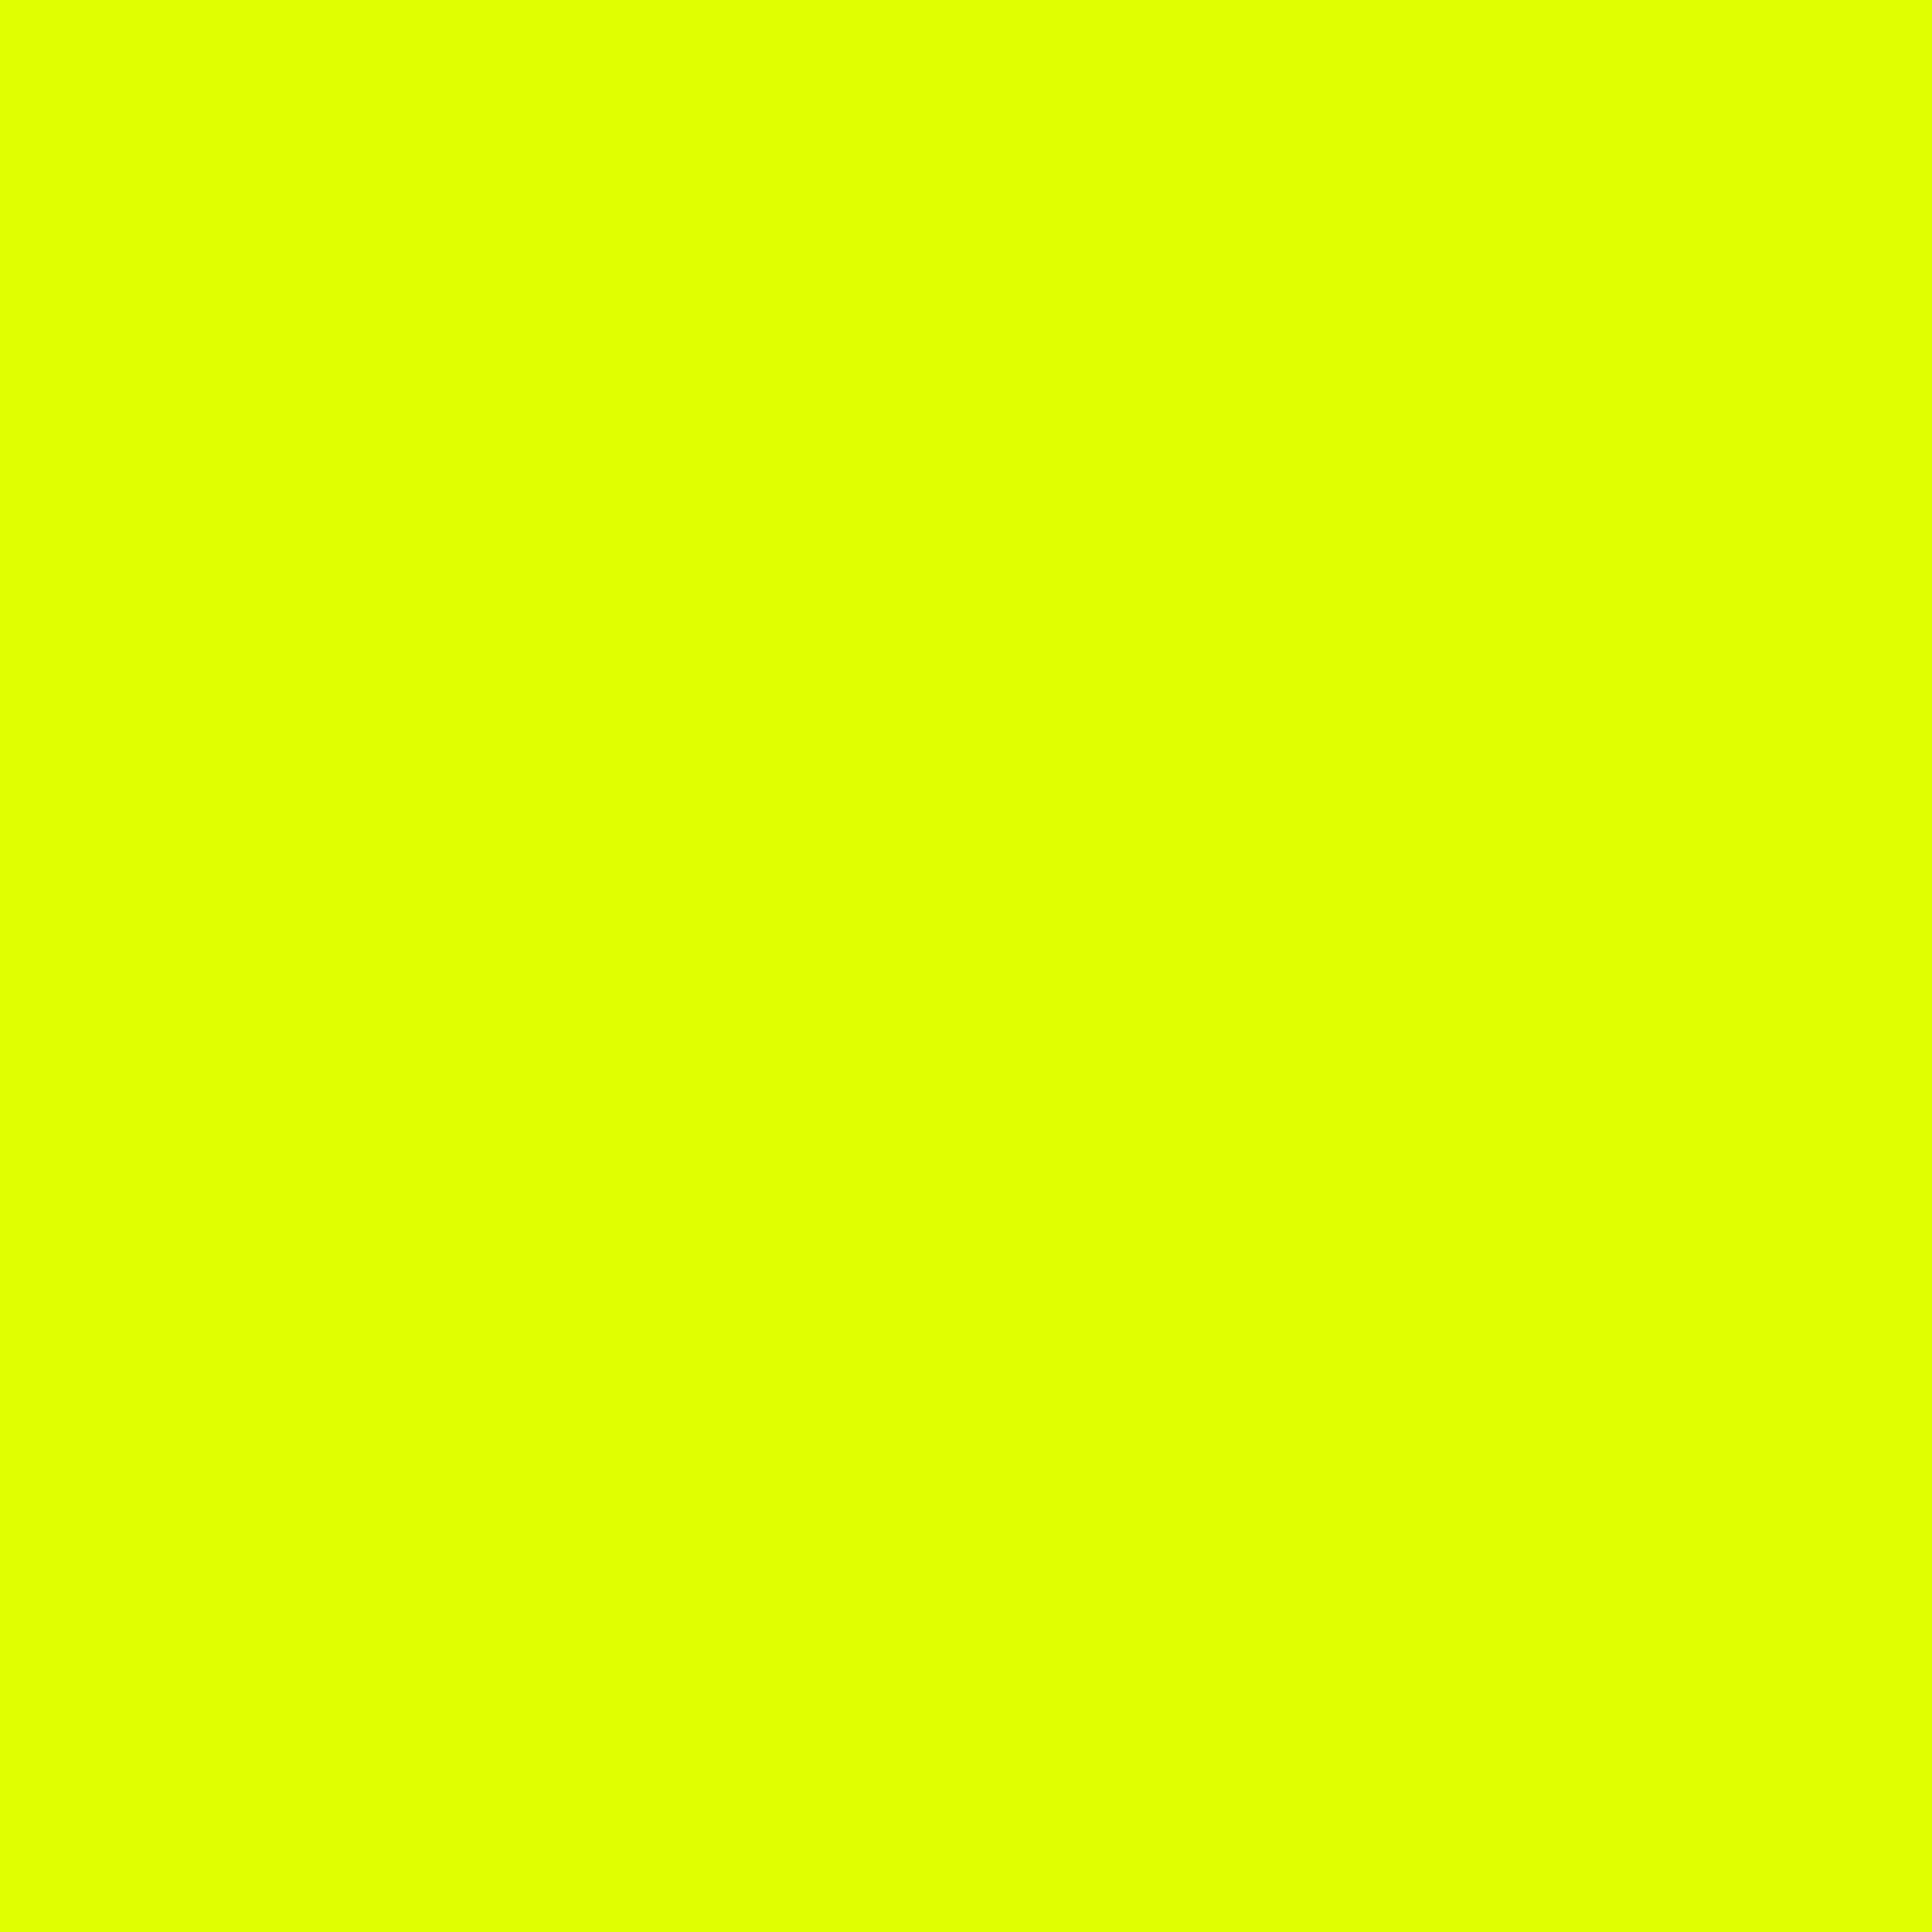 3600x3600 Lemon Lime Solid Color Background